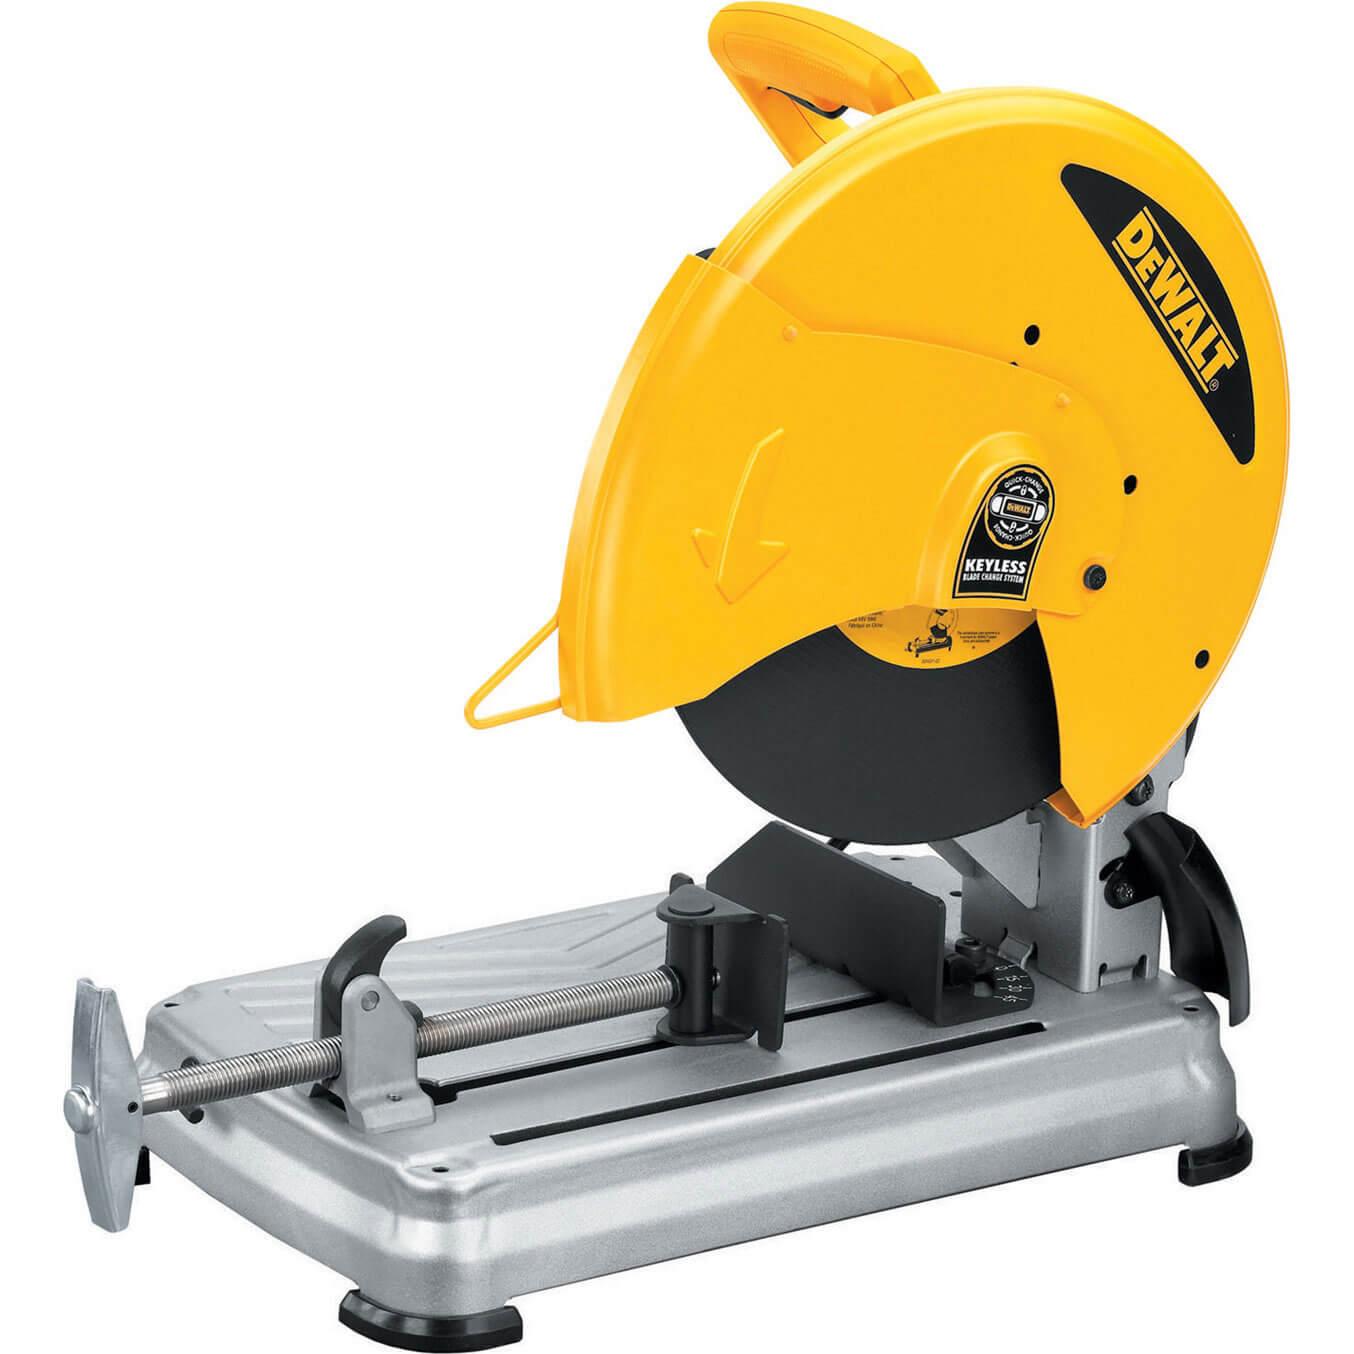 DeWalt D28715 Metal Cut Off Saw 2200w 110v